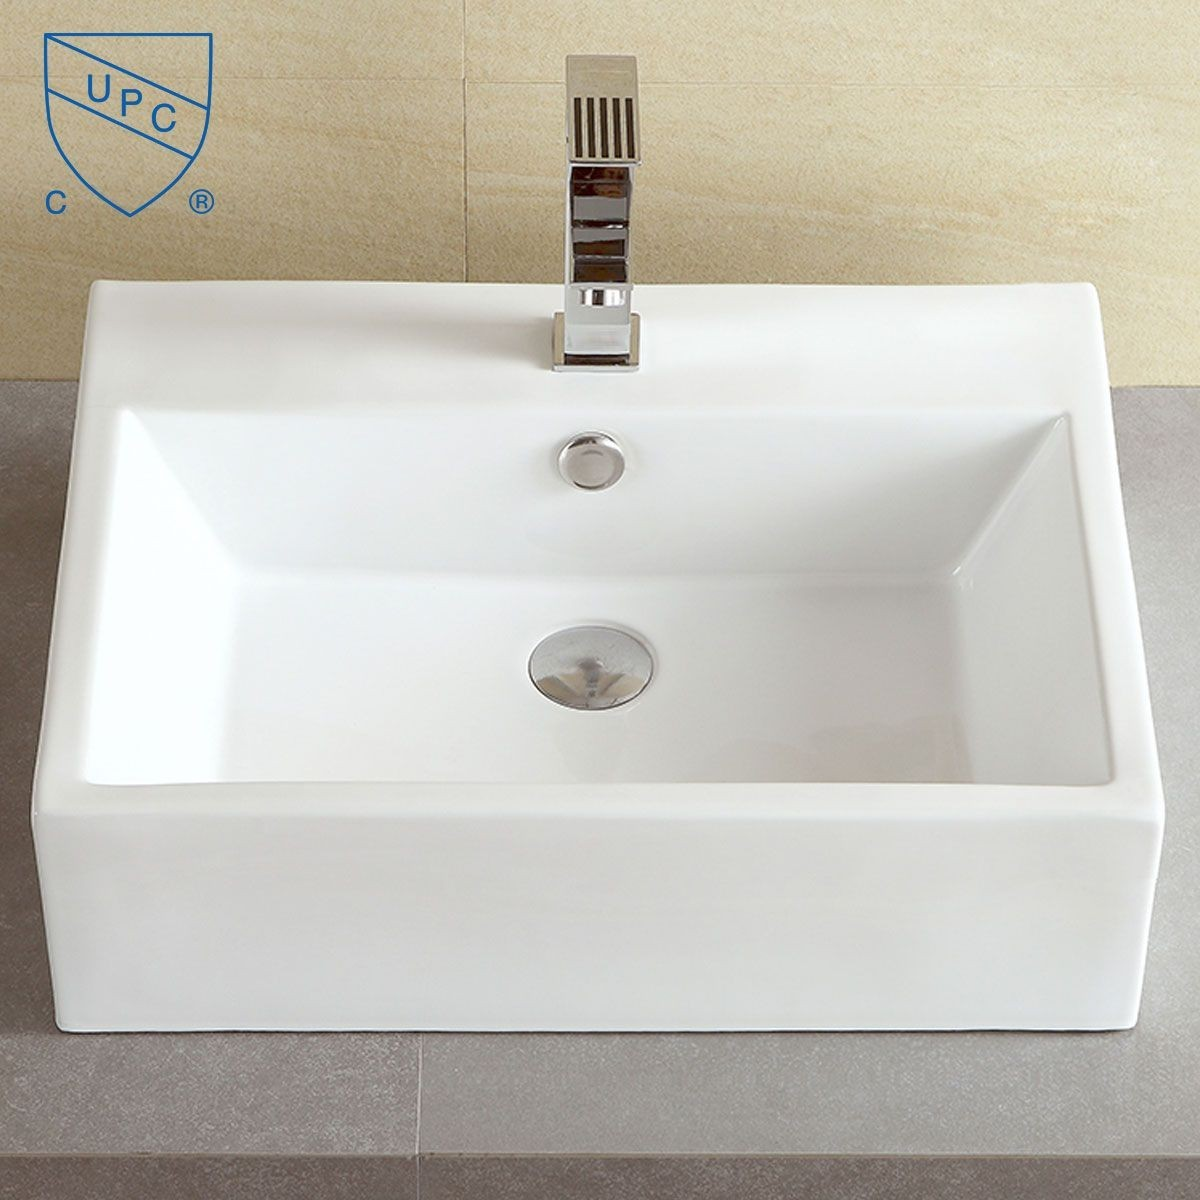 lavabo vasque rectangle de dessus de comptoir en c ramique blanche cl 1094 decoraport canada. Black Bedroom Furniture Sets. Home Design Ideas